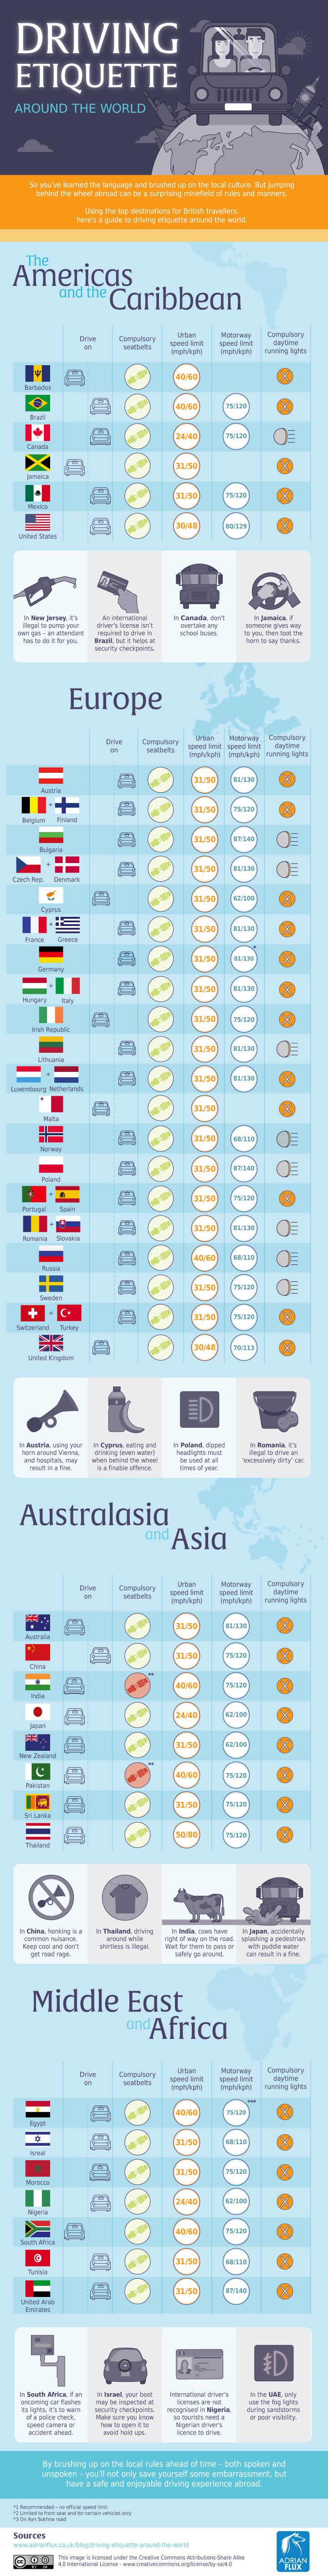 networking etiquette around the world